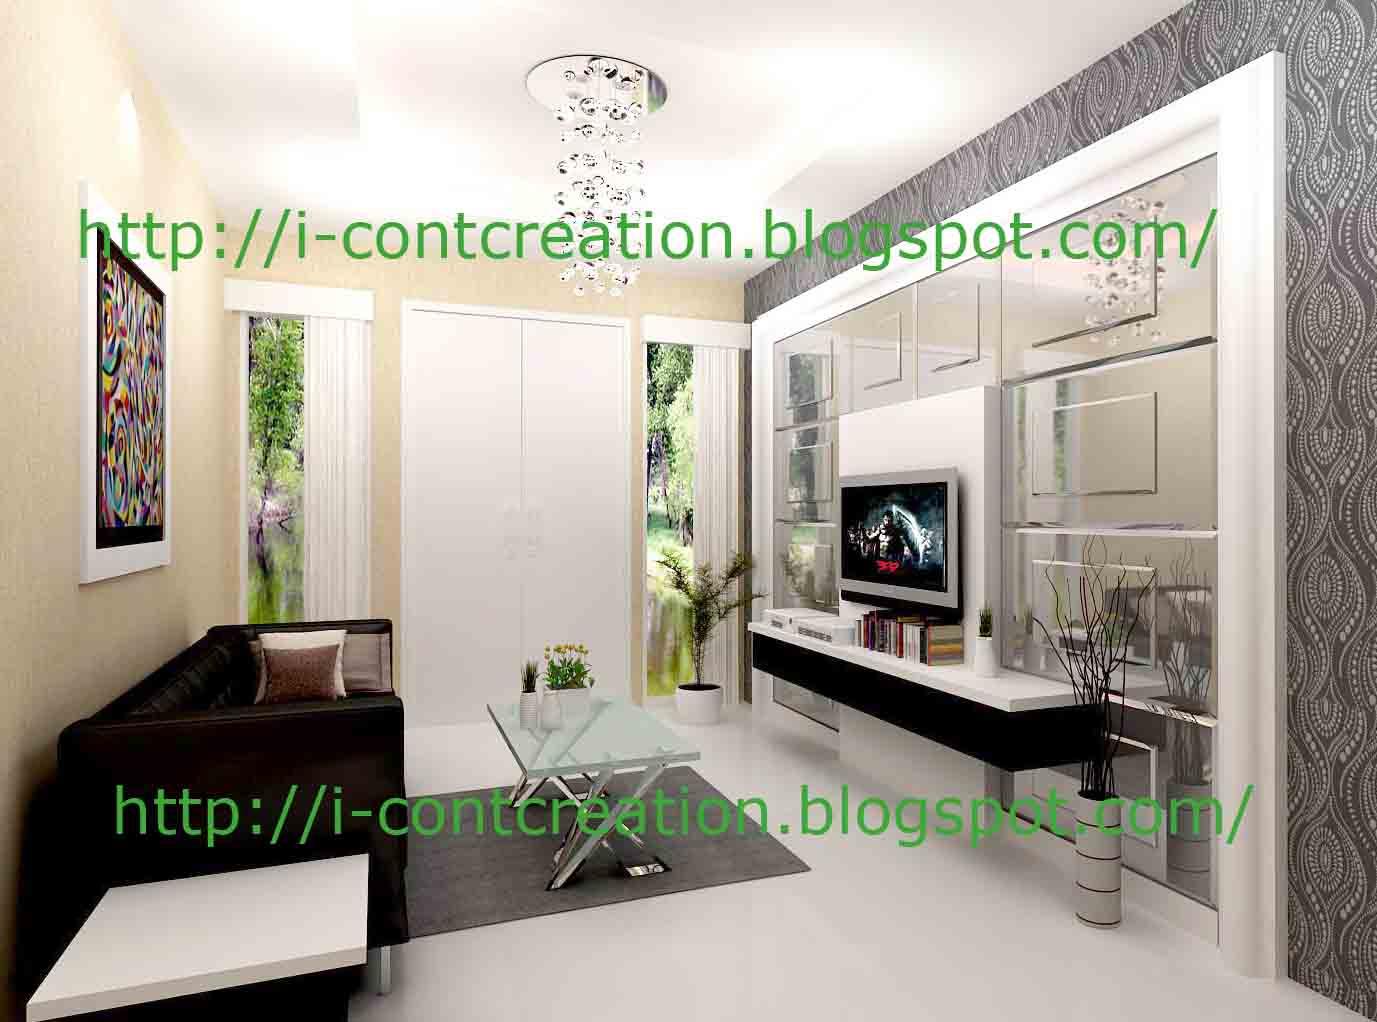 Unit Apartemen Pun Sering Menempatkan Cermin Berukuran Besar Sehingga Hunian Vertikal Tersebut Terkesan Luas